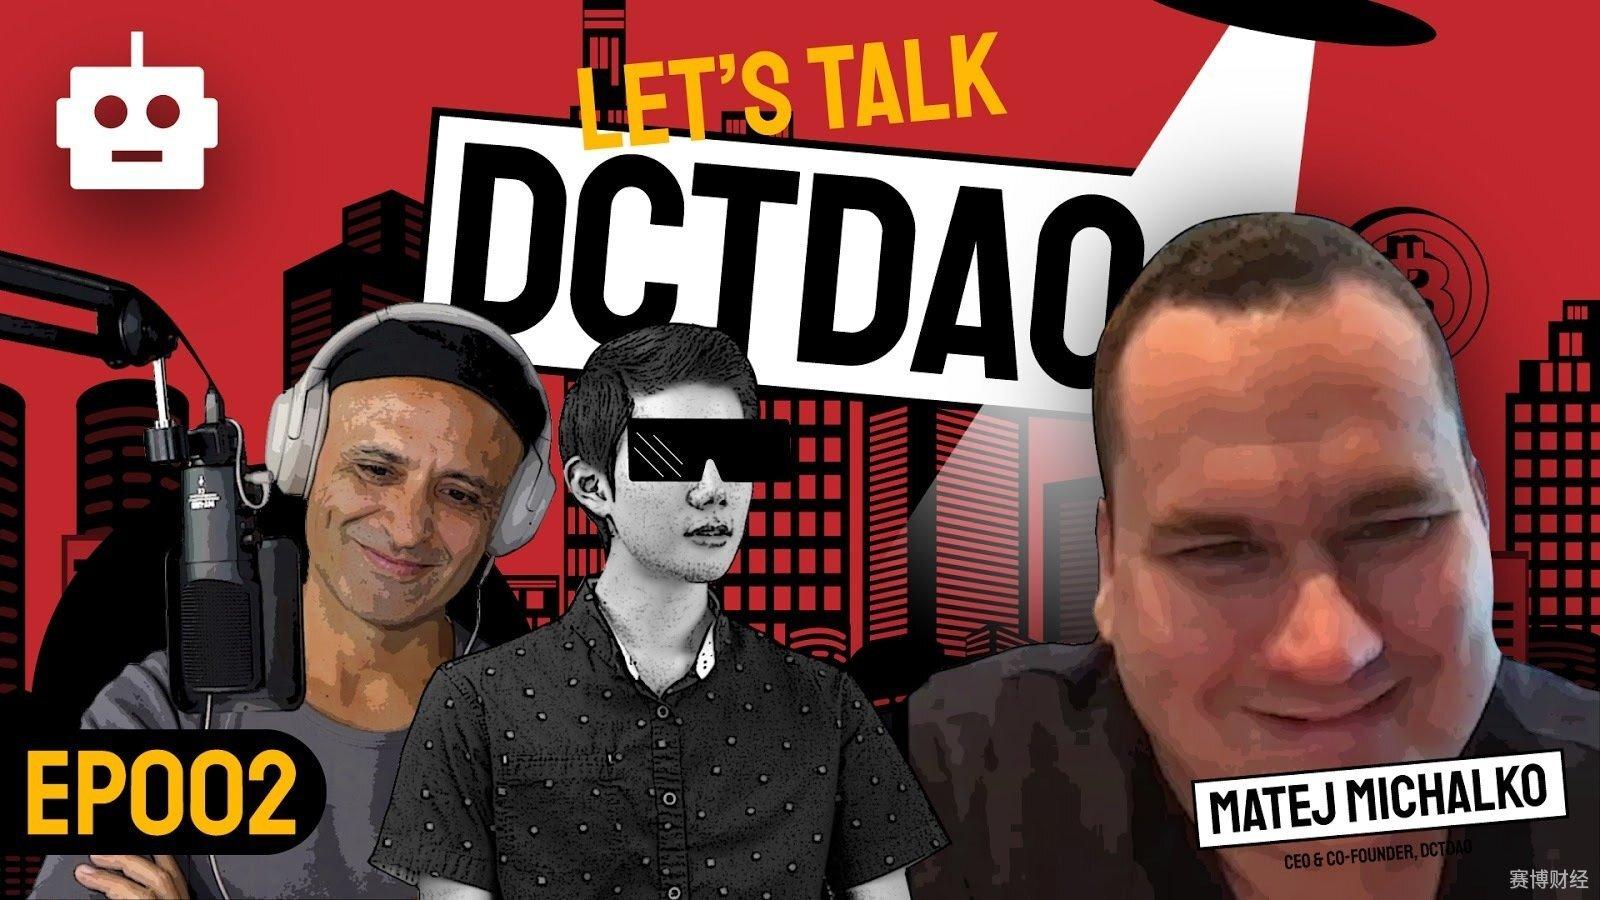 EP002-DCTDAO-Thumbnail